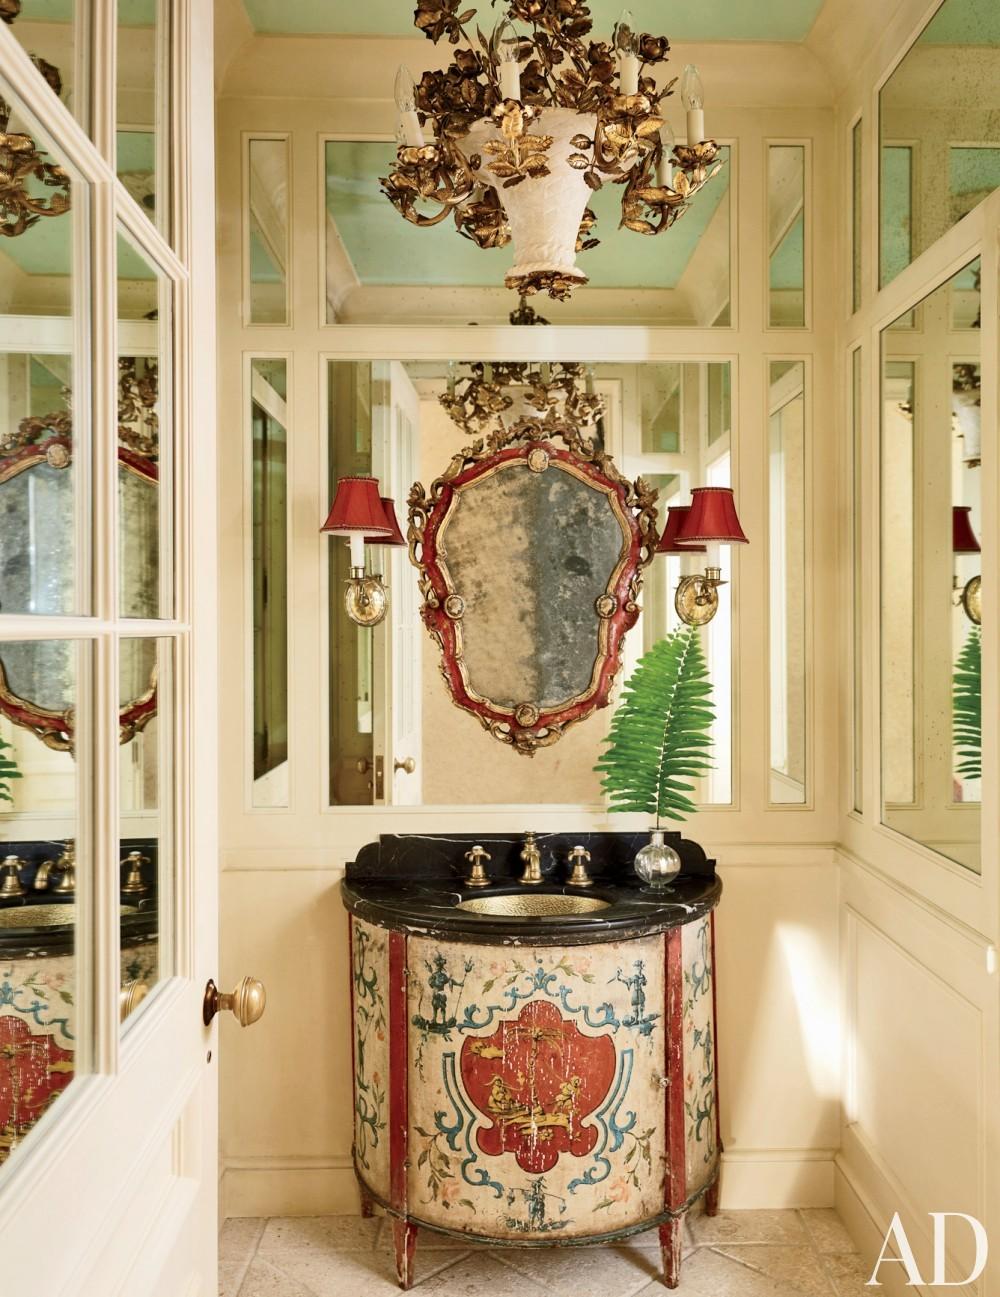 Traditional Bathroom by David Easton Inc. and Addison Mizner in Palm Beach, FL